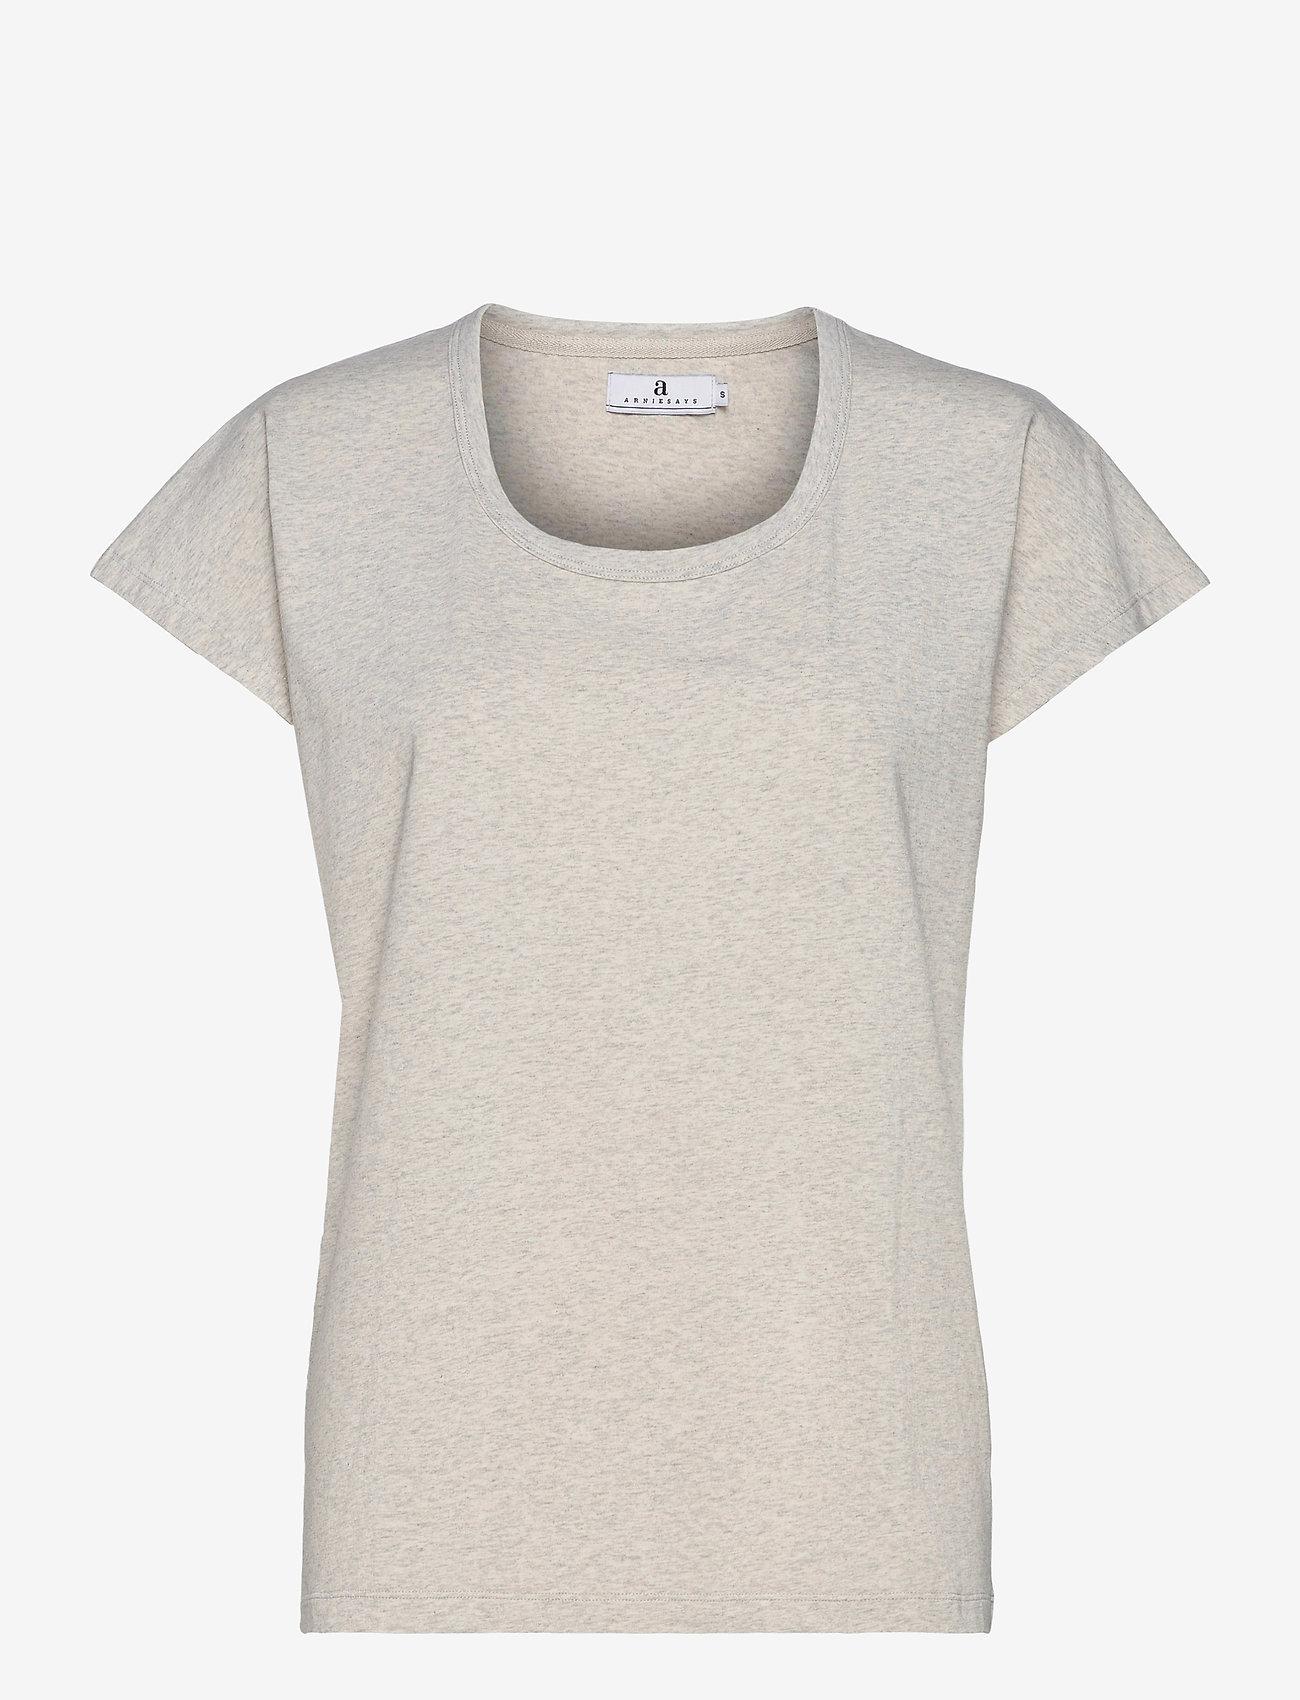 Arnie Says - Hadley Cotton - t-shirt & tops - lt grey melange - 0